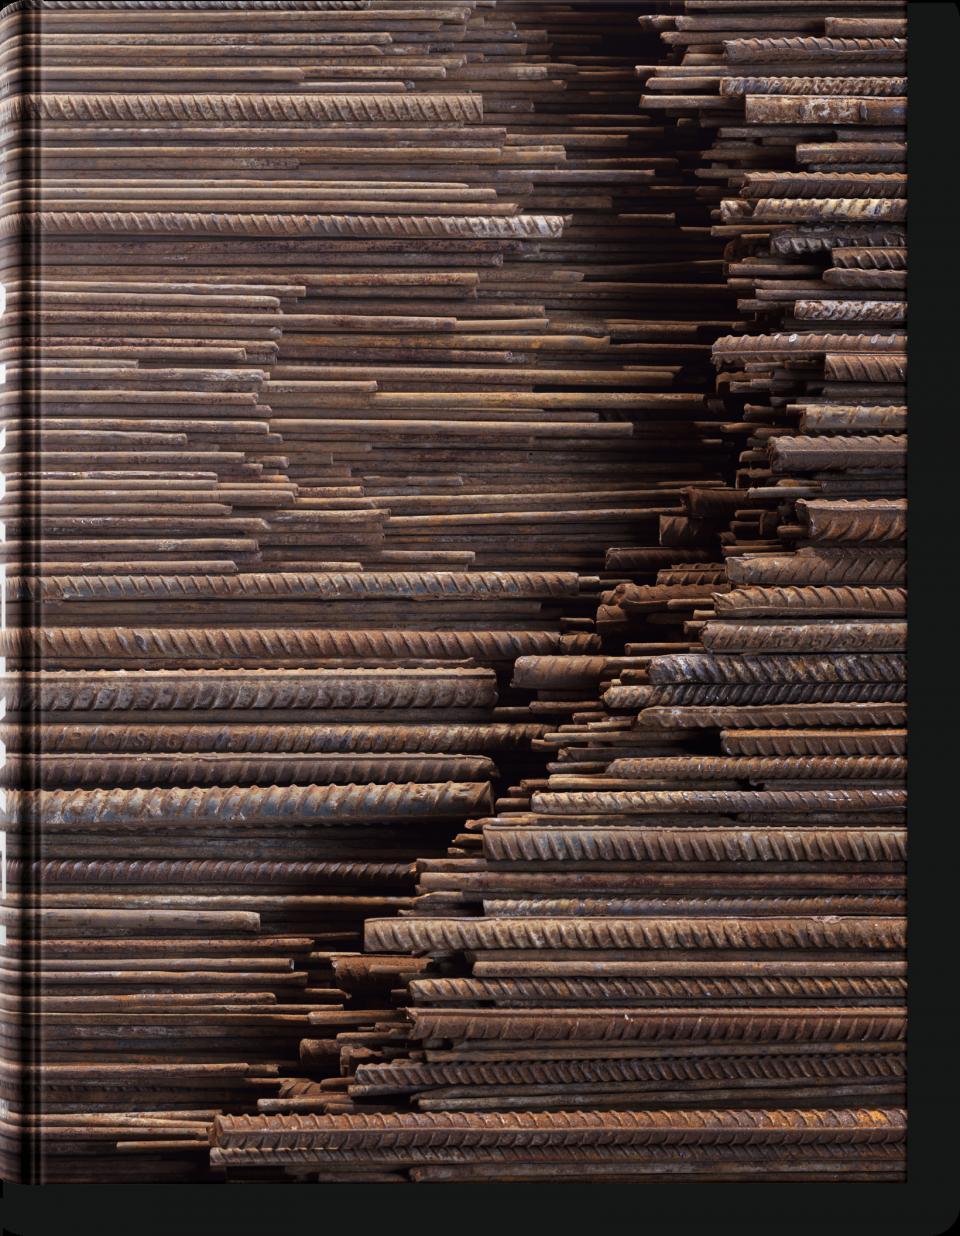 bcfbaf84bc17c Ai Weiwei Limited Edition Taschen Books – Klassik Magazine